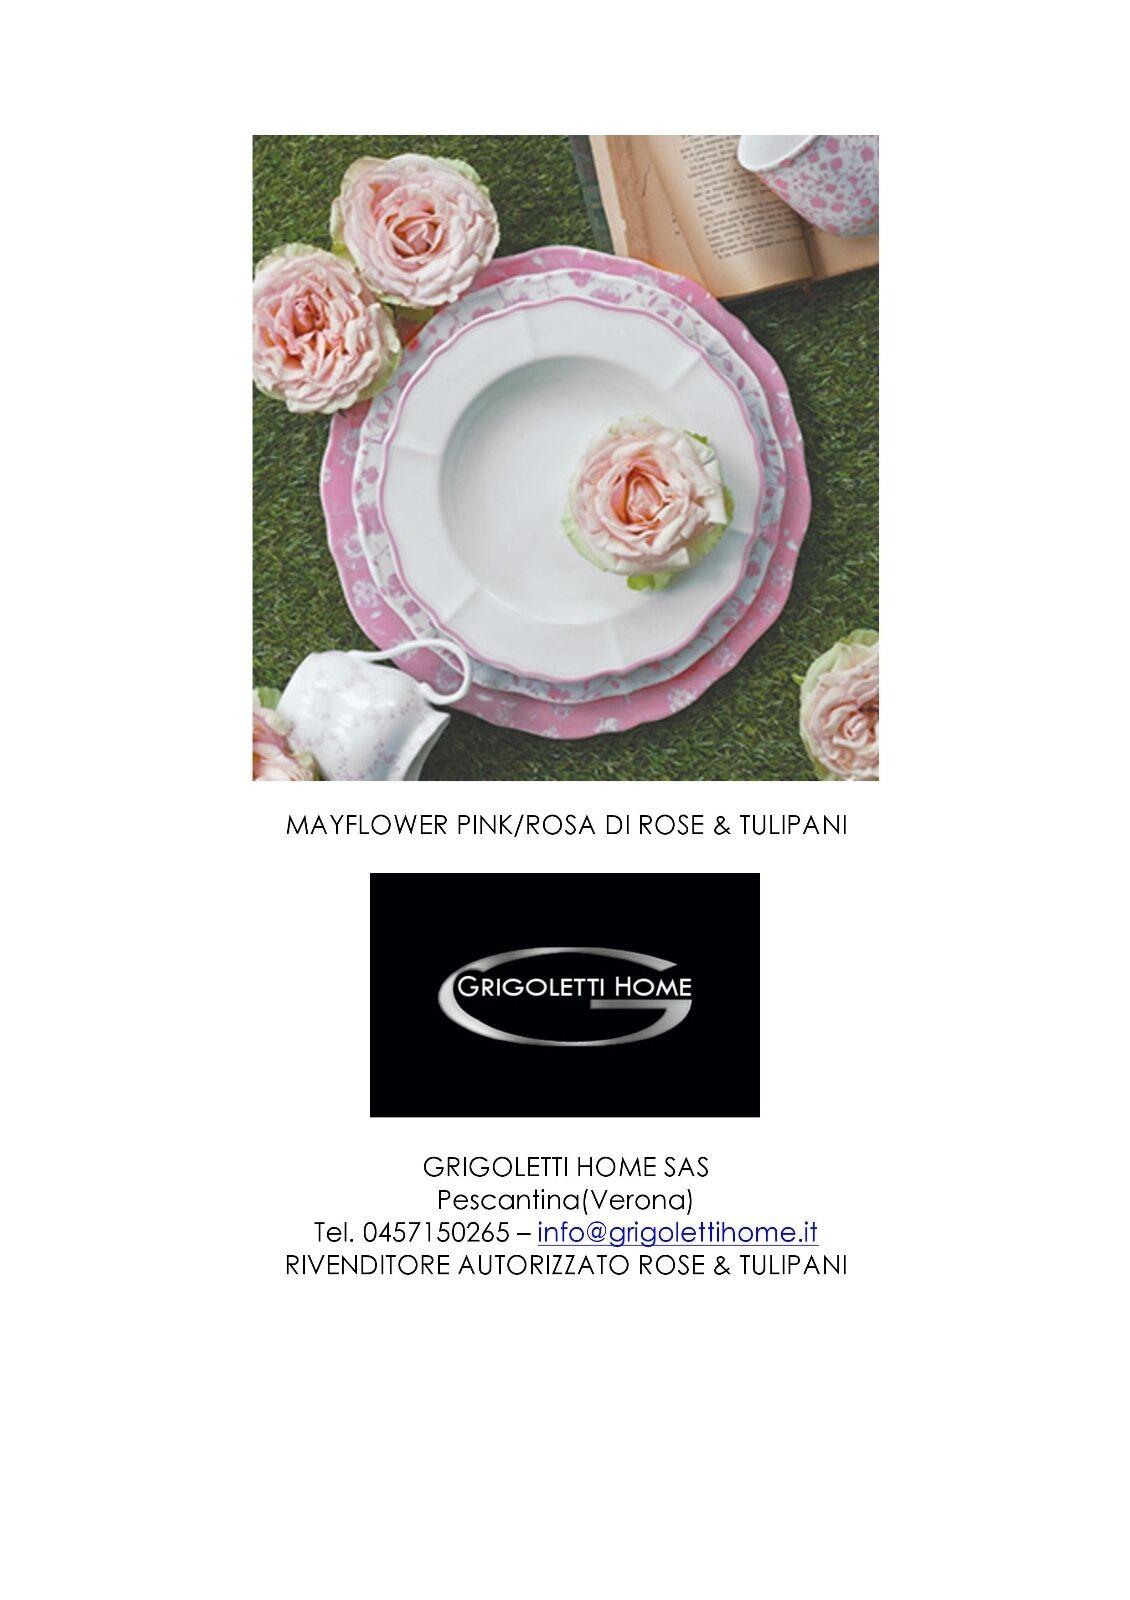 Rose et Tulipes - Service Flat 38 Pièces 12 Pers Mayflower Rose - Revendeur